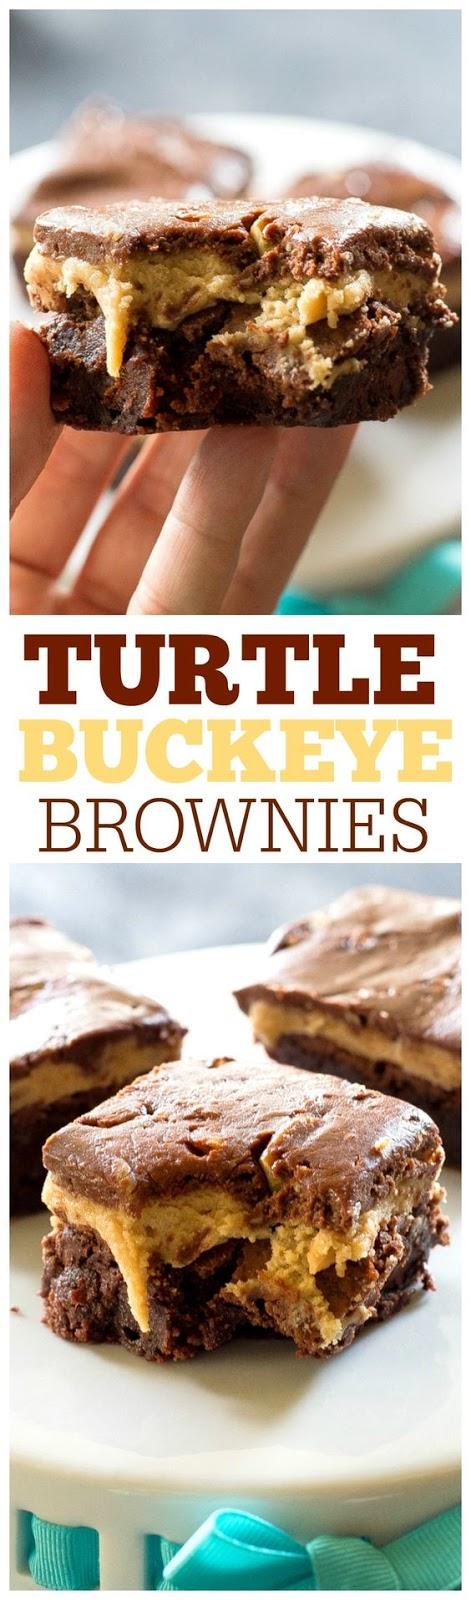 Turtle Buckeye Brownies